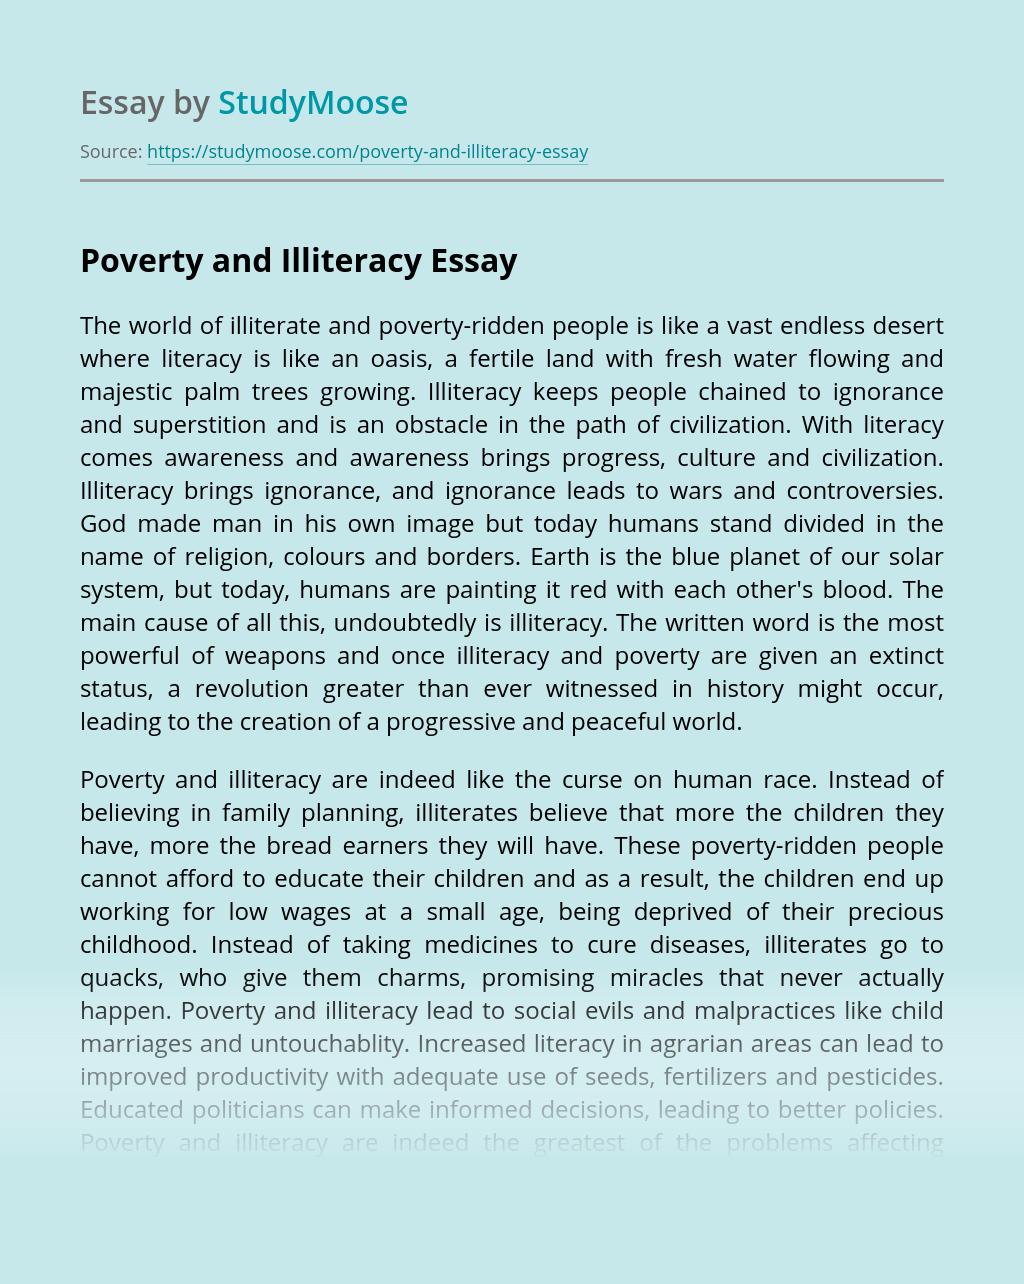 poverty and illiteracy essay example